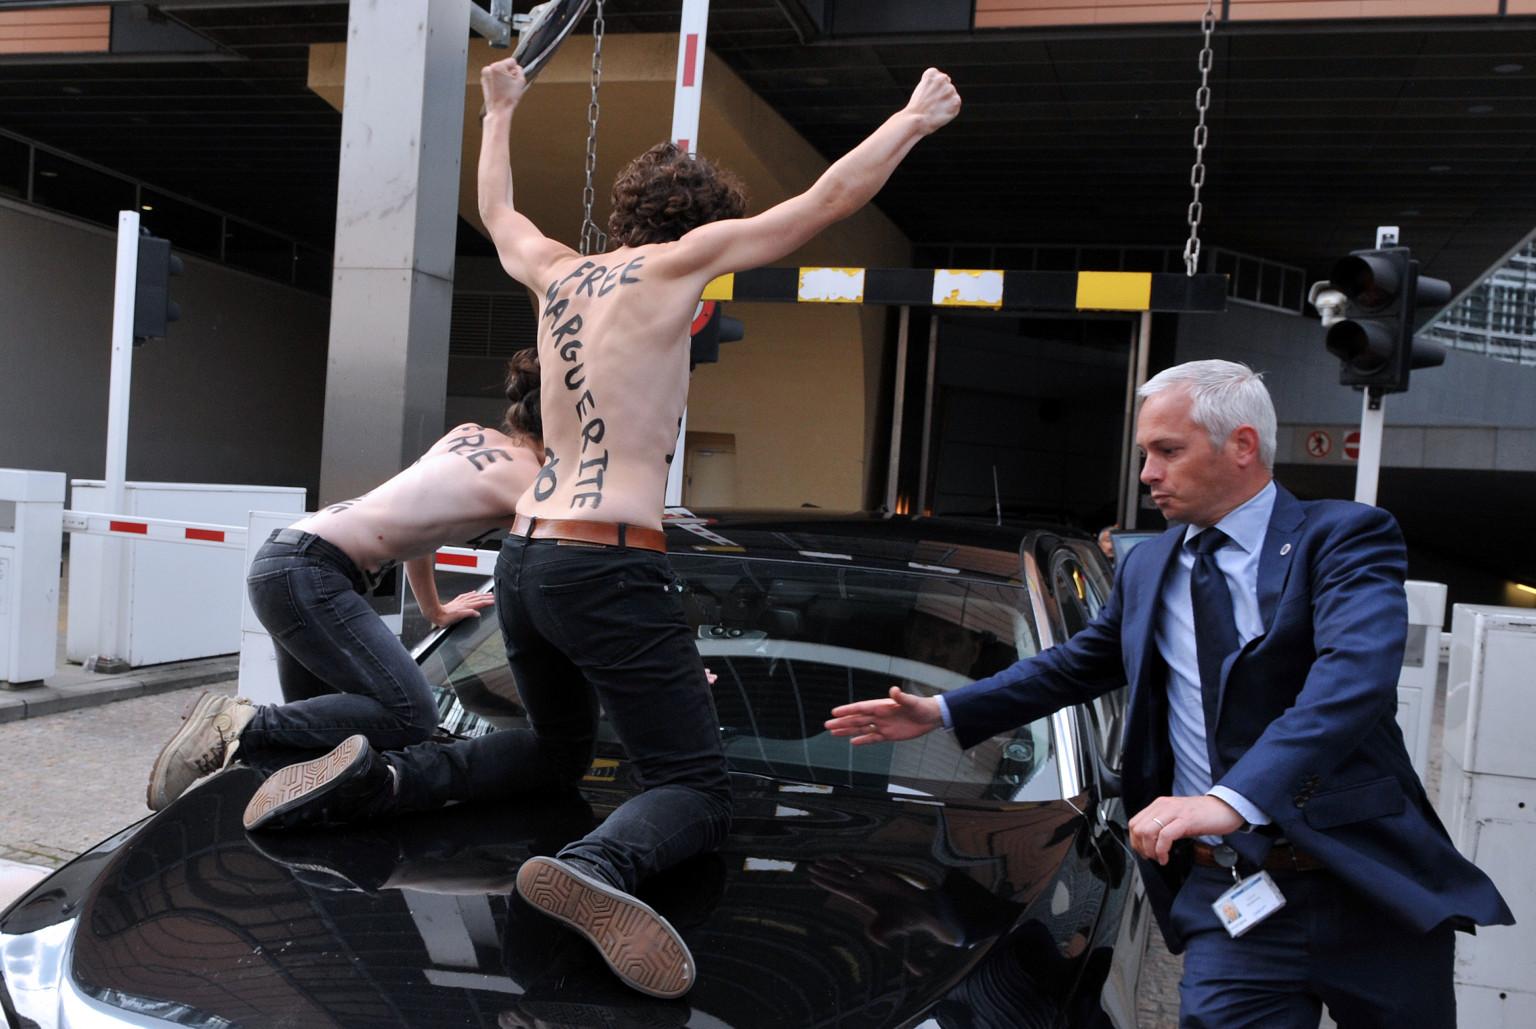 femen protest louvre - photo #9